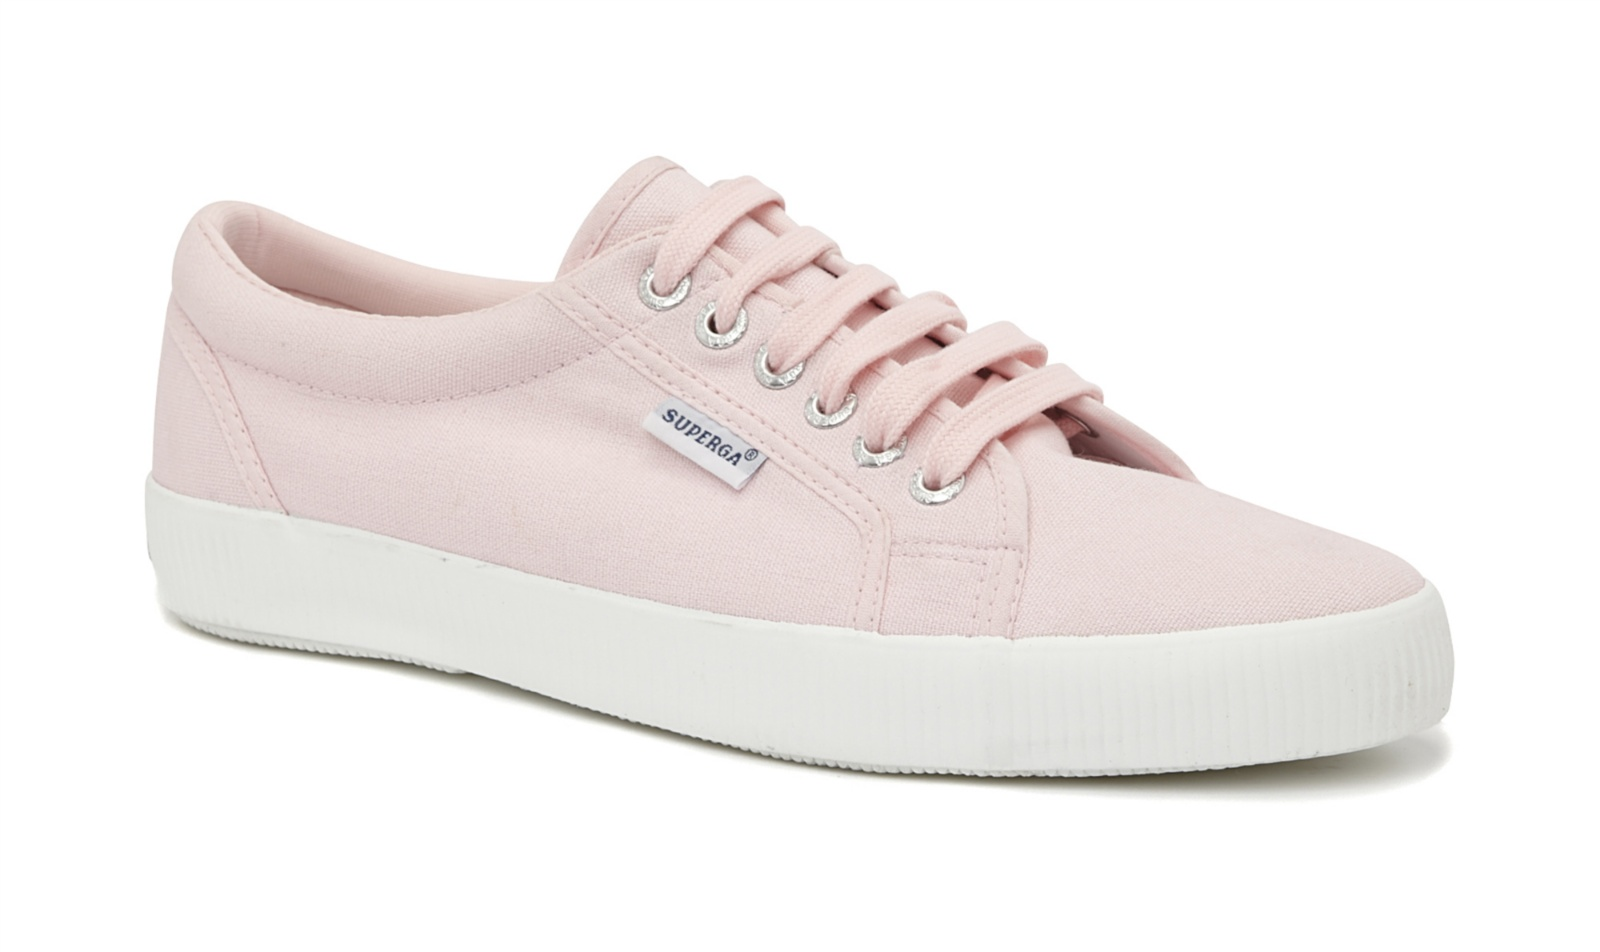 selectism - adidas-tennis-shoe-03